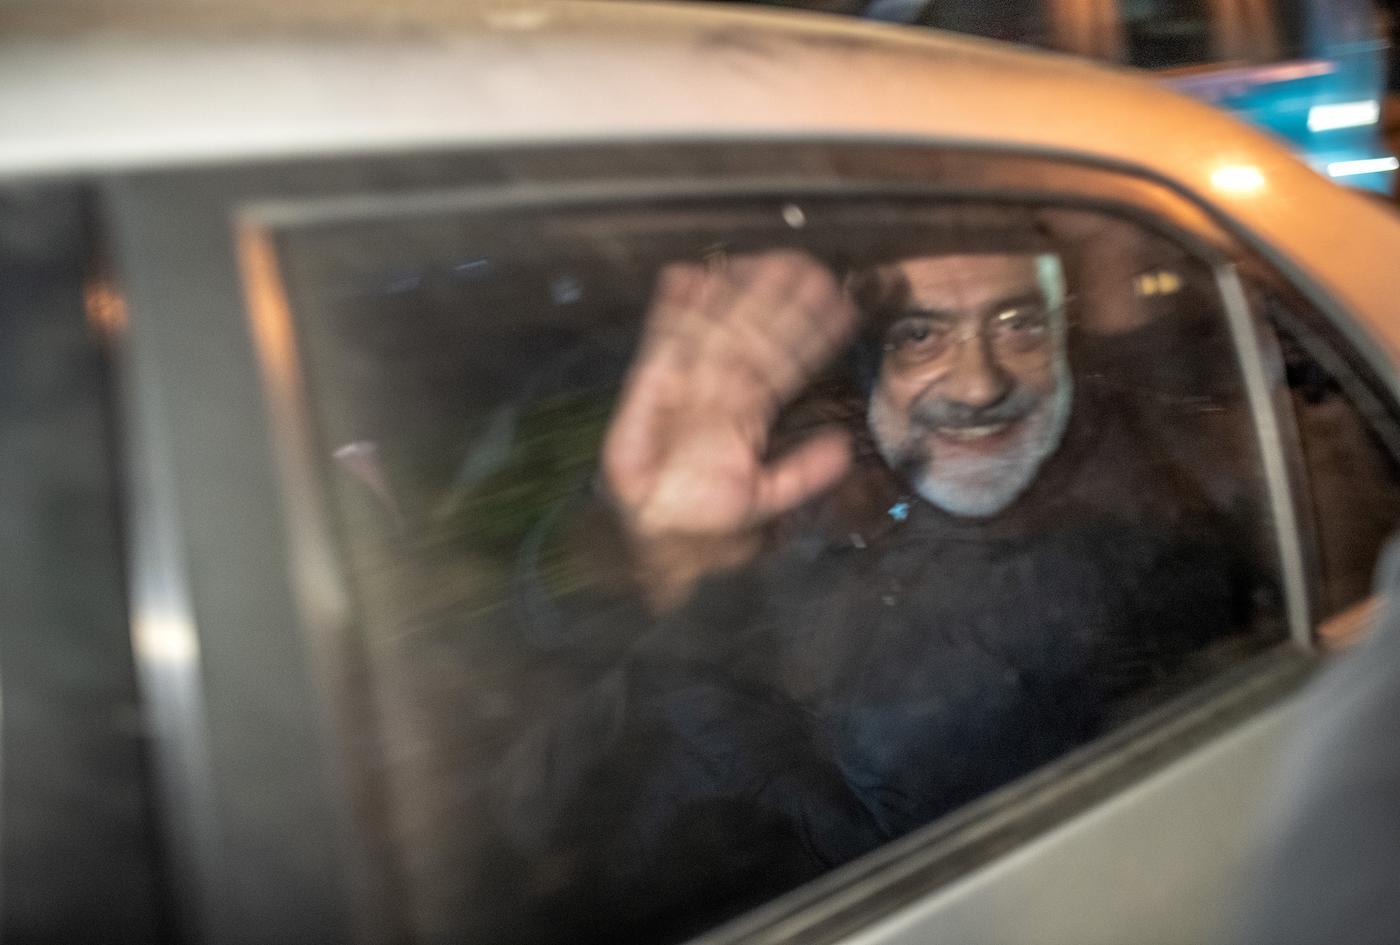 Released FETO member arrested in Istanbul